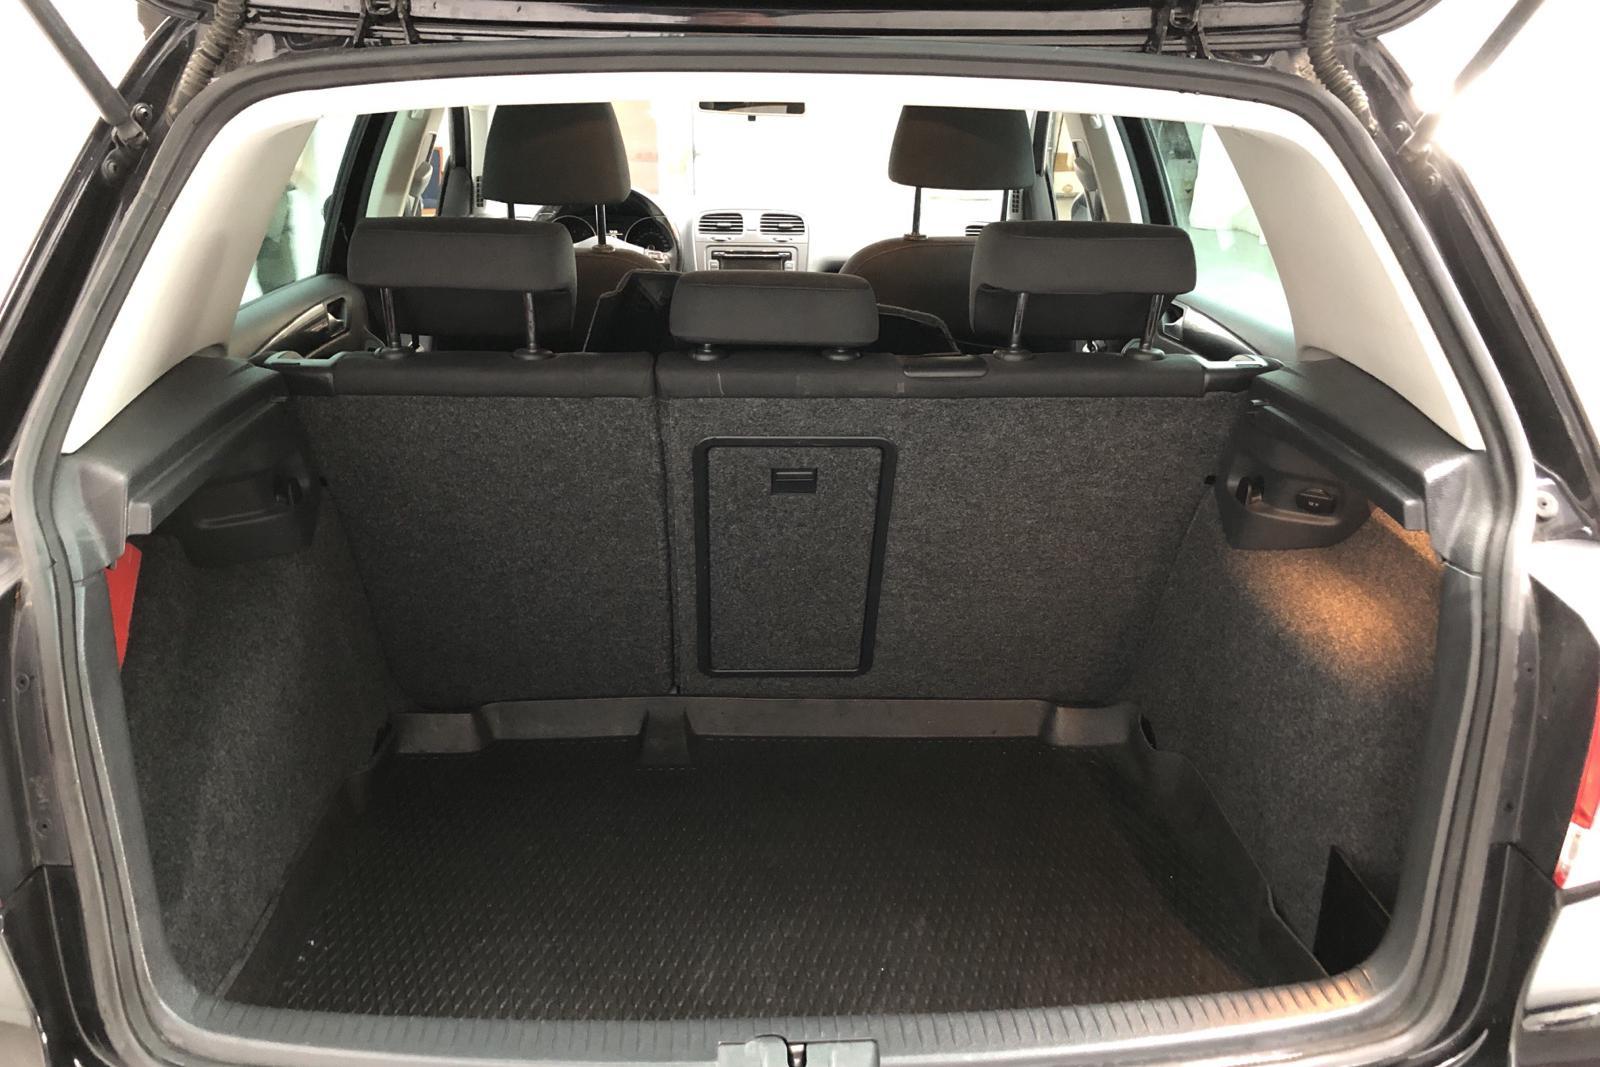 VW Golf VI 1.4 TSI 5dr (122hk) - 9 898 mil - Manuell - svart - 2011